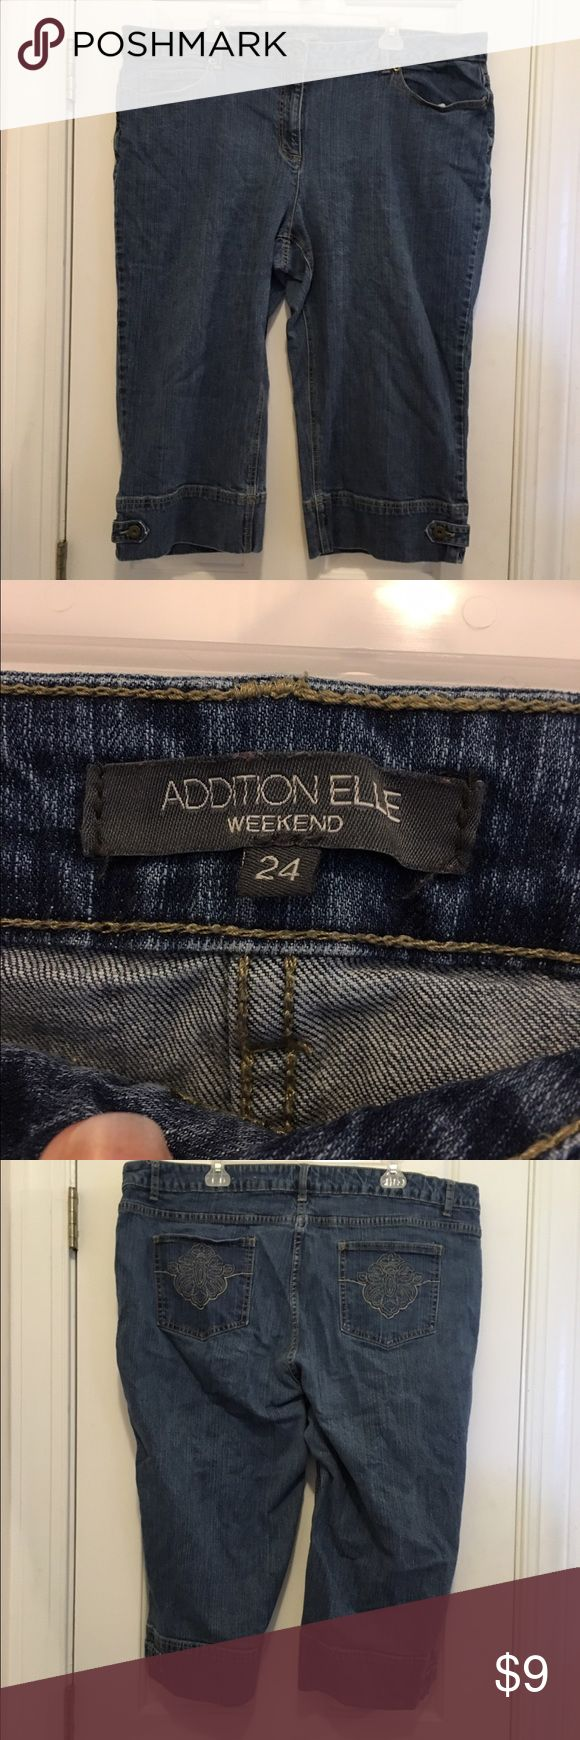 Plus size Addition Elle jean capris Addition Elle jean capris, dark wash denim, size 24, great condition and gently used. Addition Elle Pants Capris